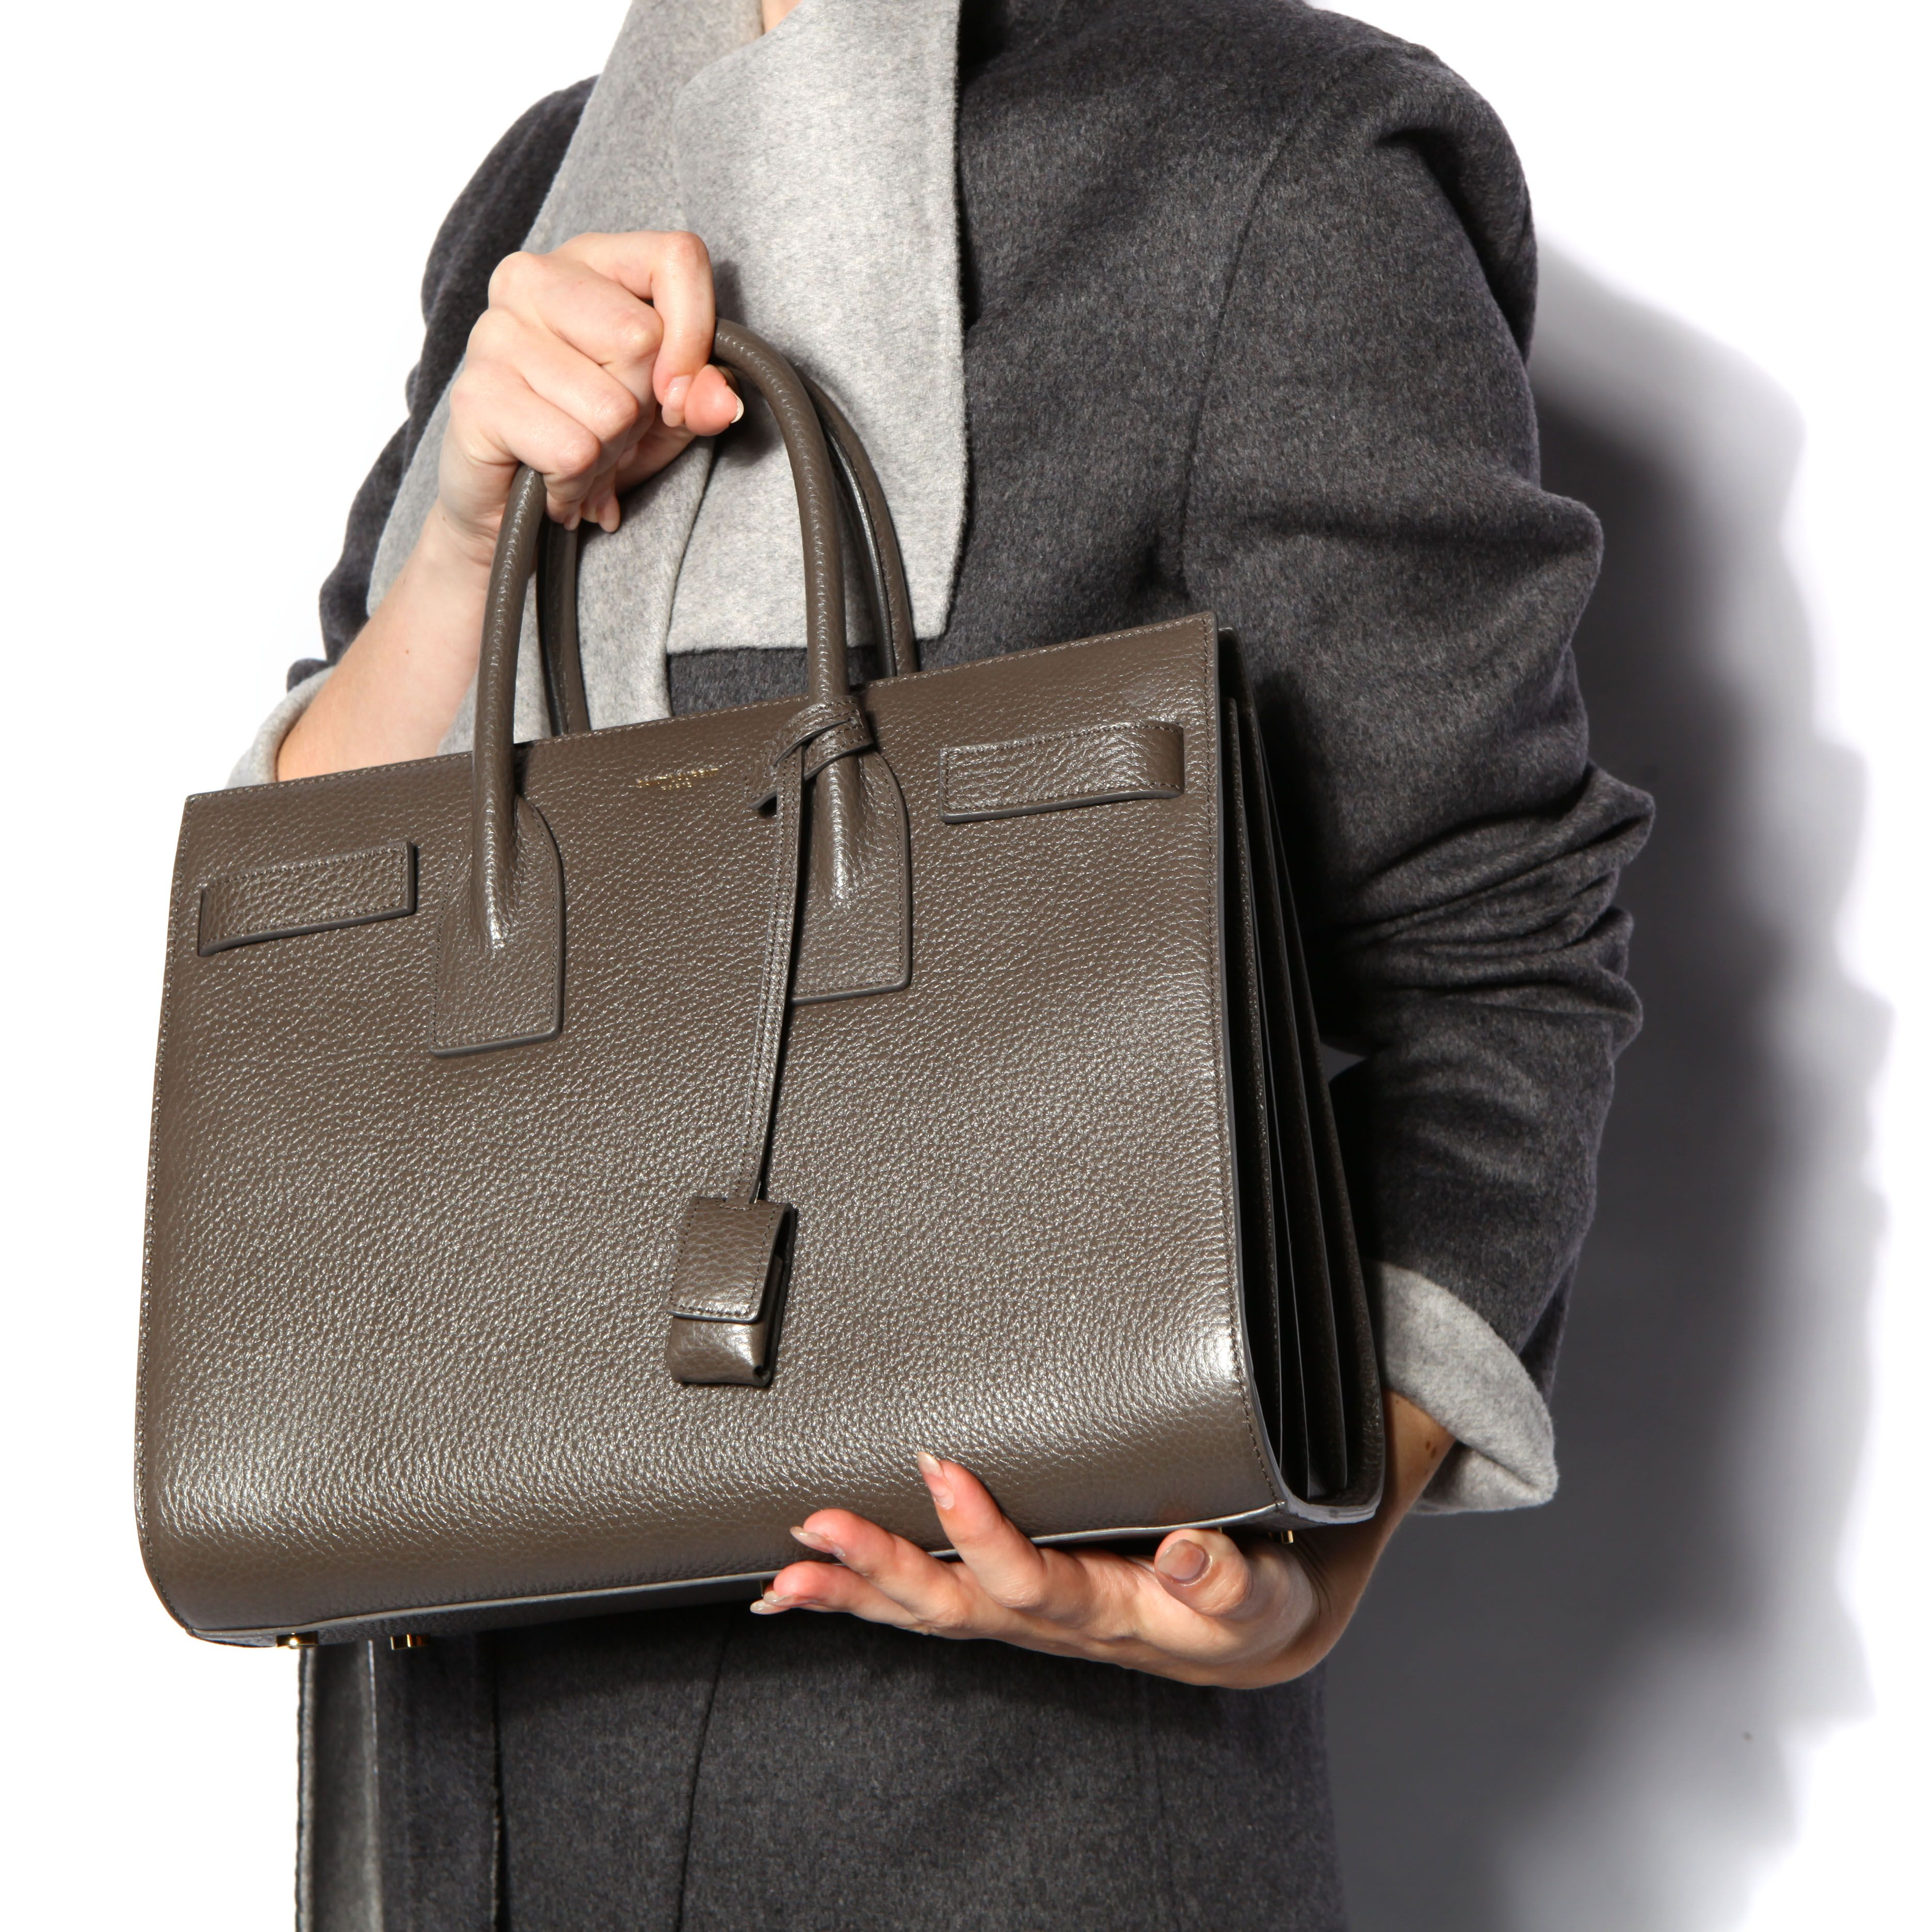 YSL envelope large bag | Ysl envelope, Yves saint laurent